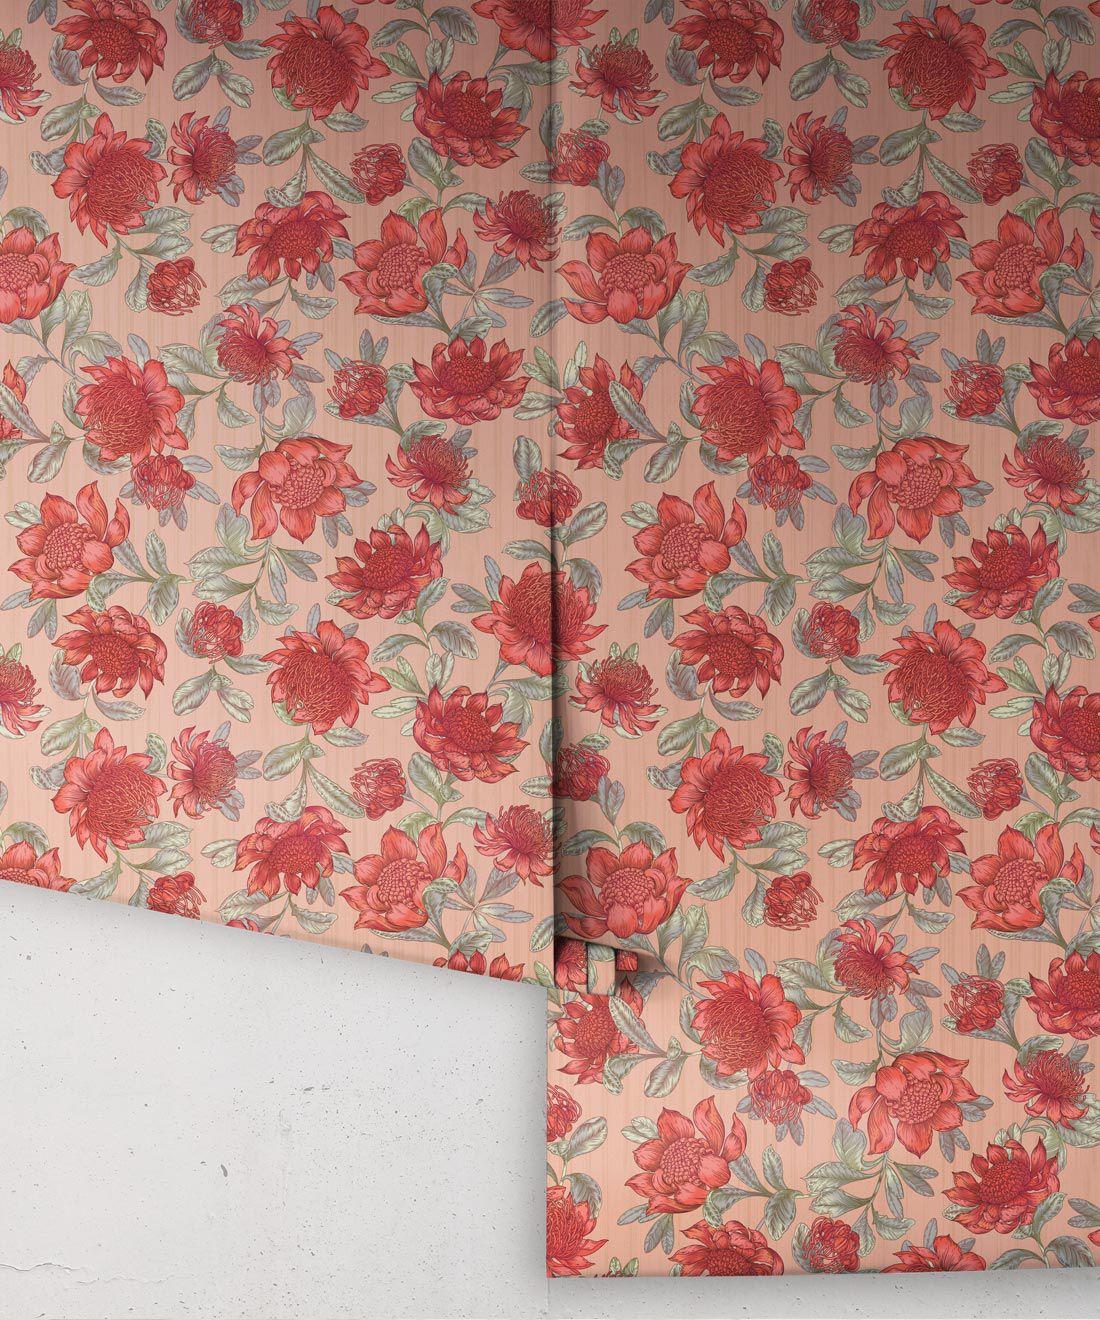 Waratah Wallpaper • Eloise Short • Vintage Floral Wallpaper •Granny Chic Wallpaper • Grandmillennial Style Wallpaper •Blush •Rolls